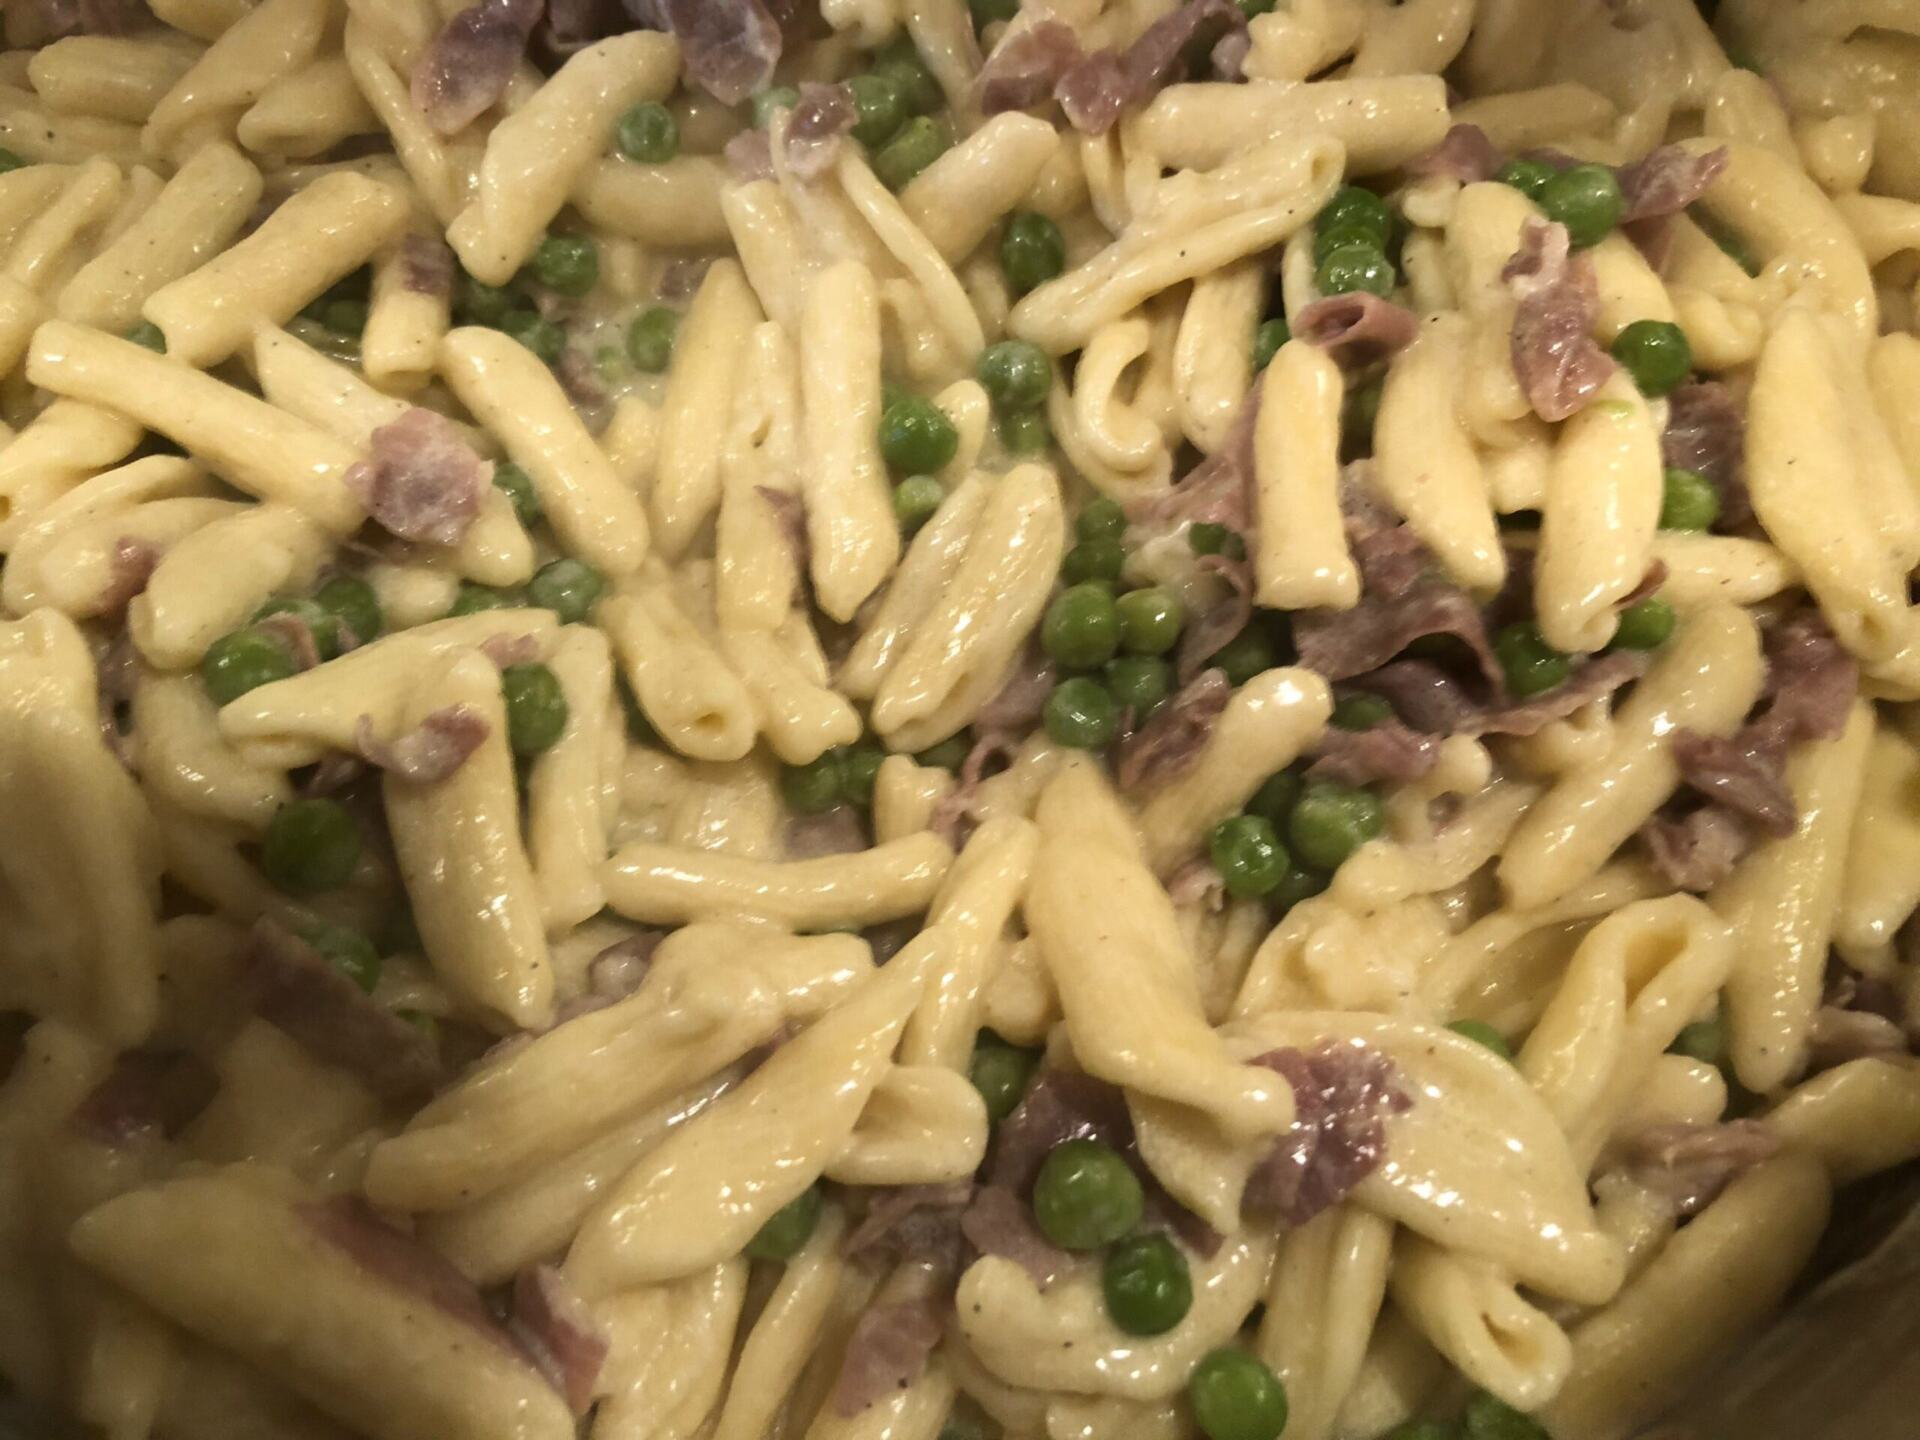 Cavatelli with Cream and truffles